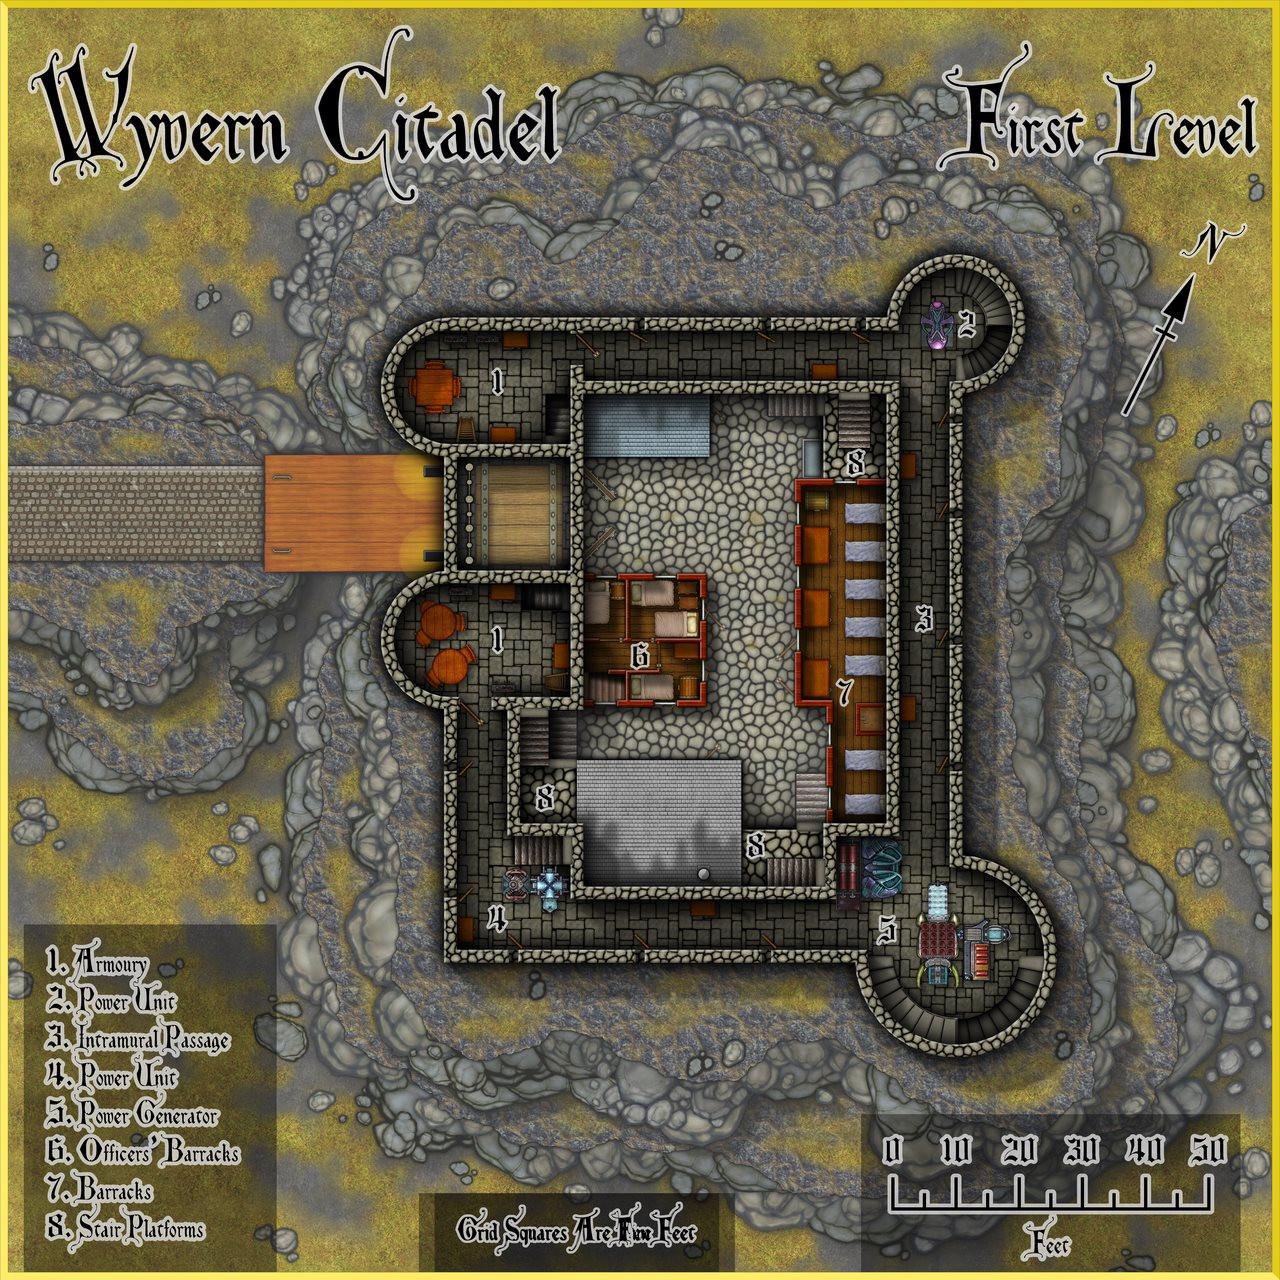 wyvern citadel - first level.jpg